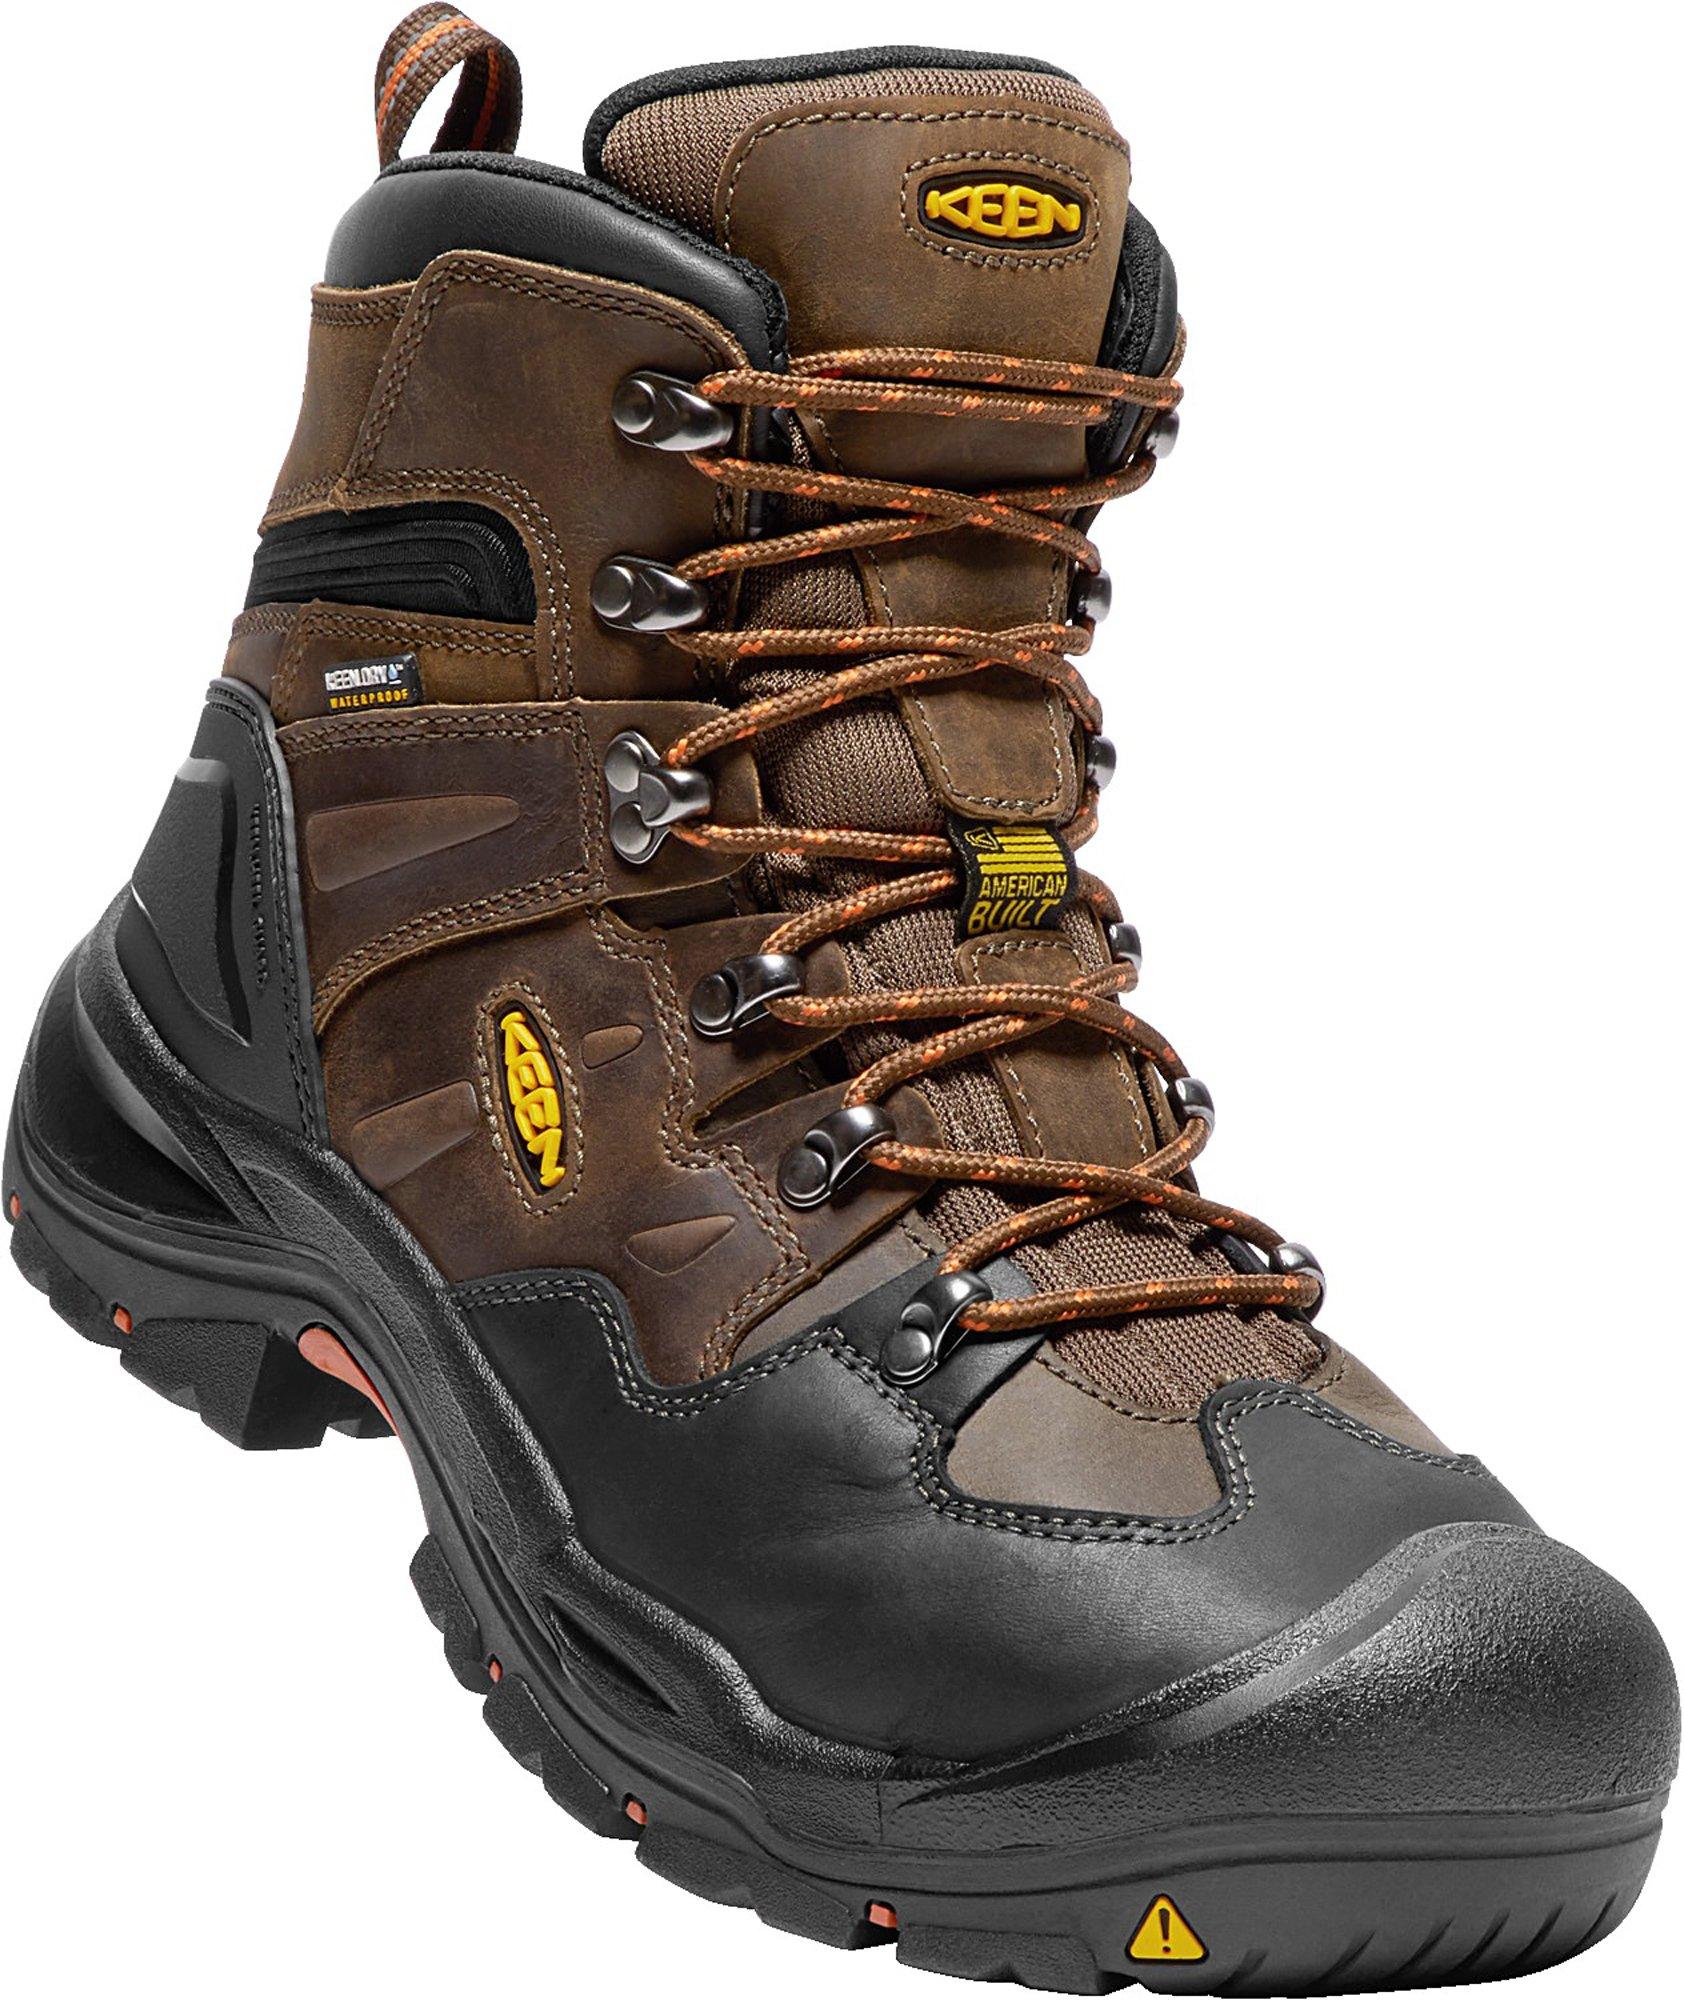 KEEN Utility Coburg 6'' WP (Steel Toe), Men's Work Boot, Cascade Brown/Brindle, 8 EE by KEEN Utility (Image #7)